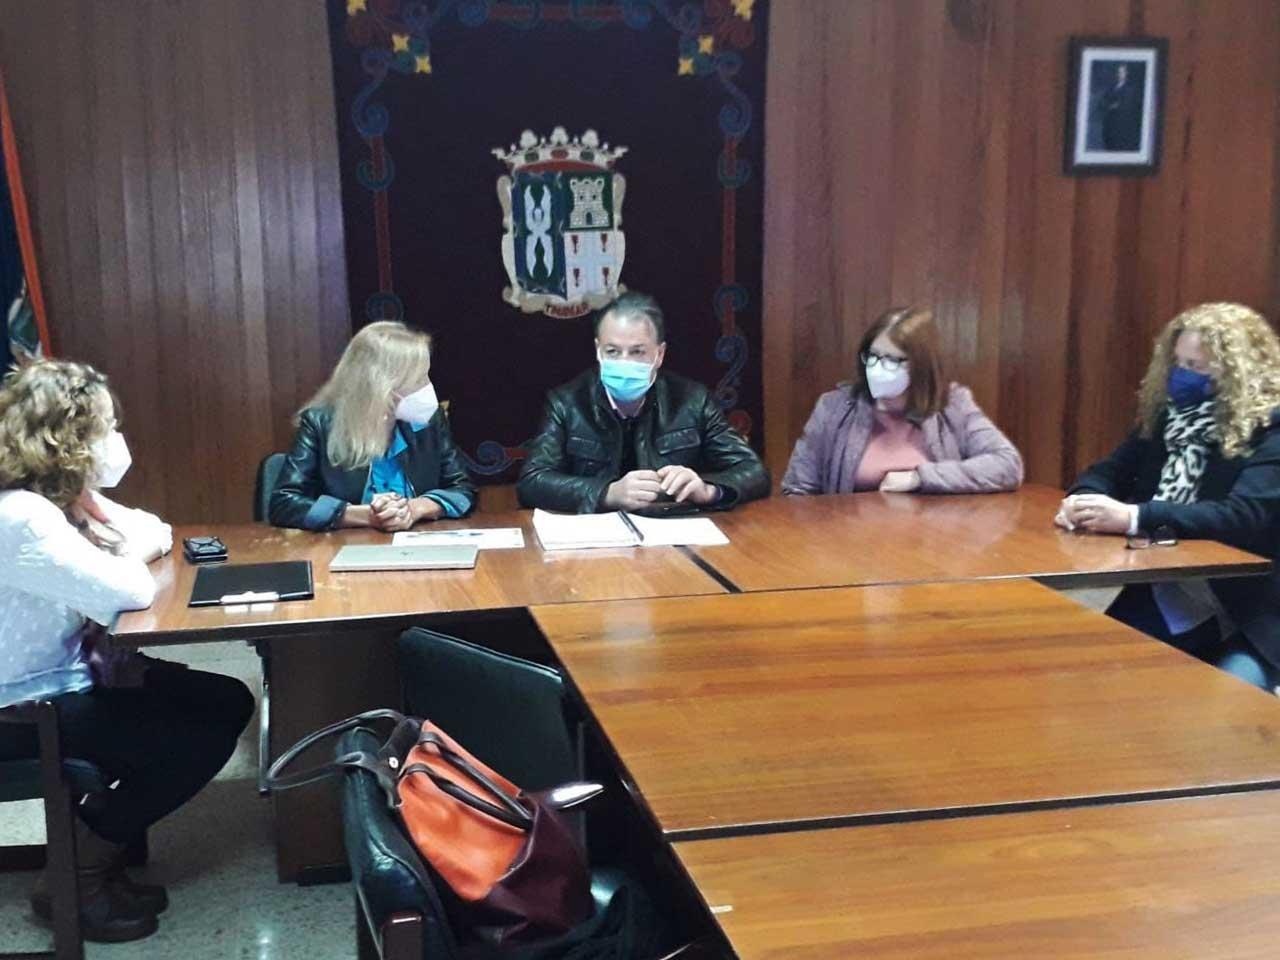 La Directora General de Infraestructura Educativa visita San Mateo